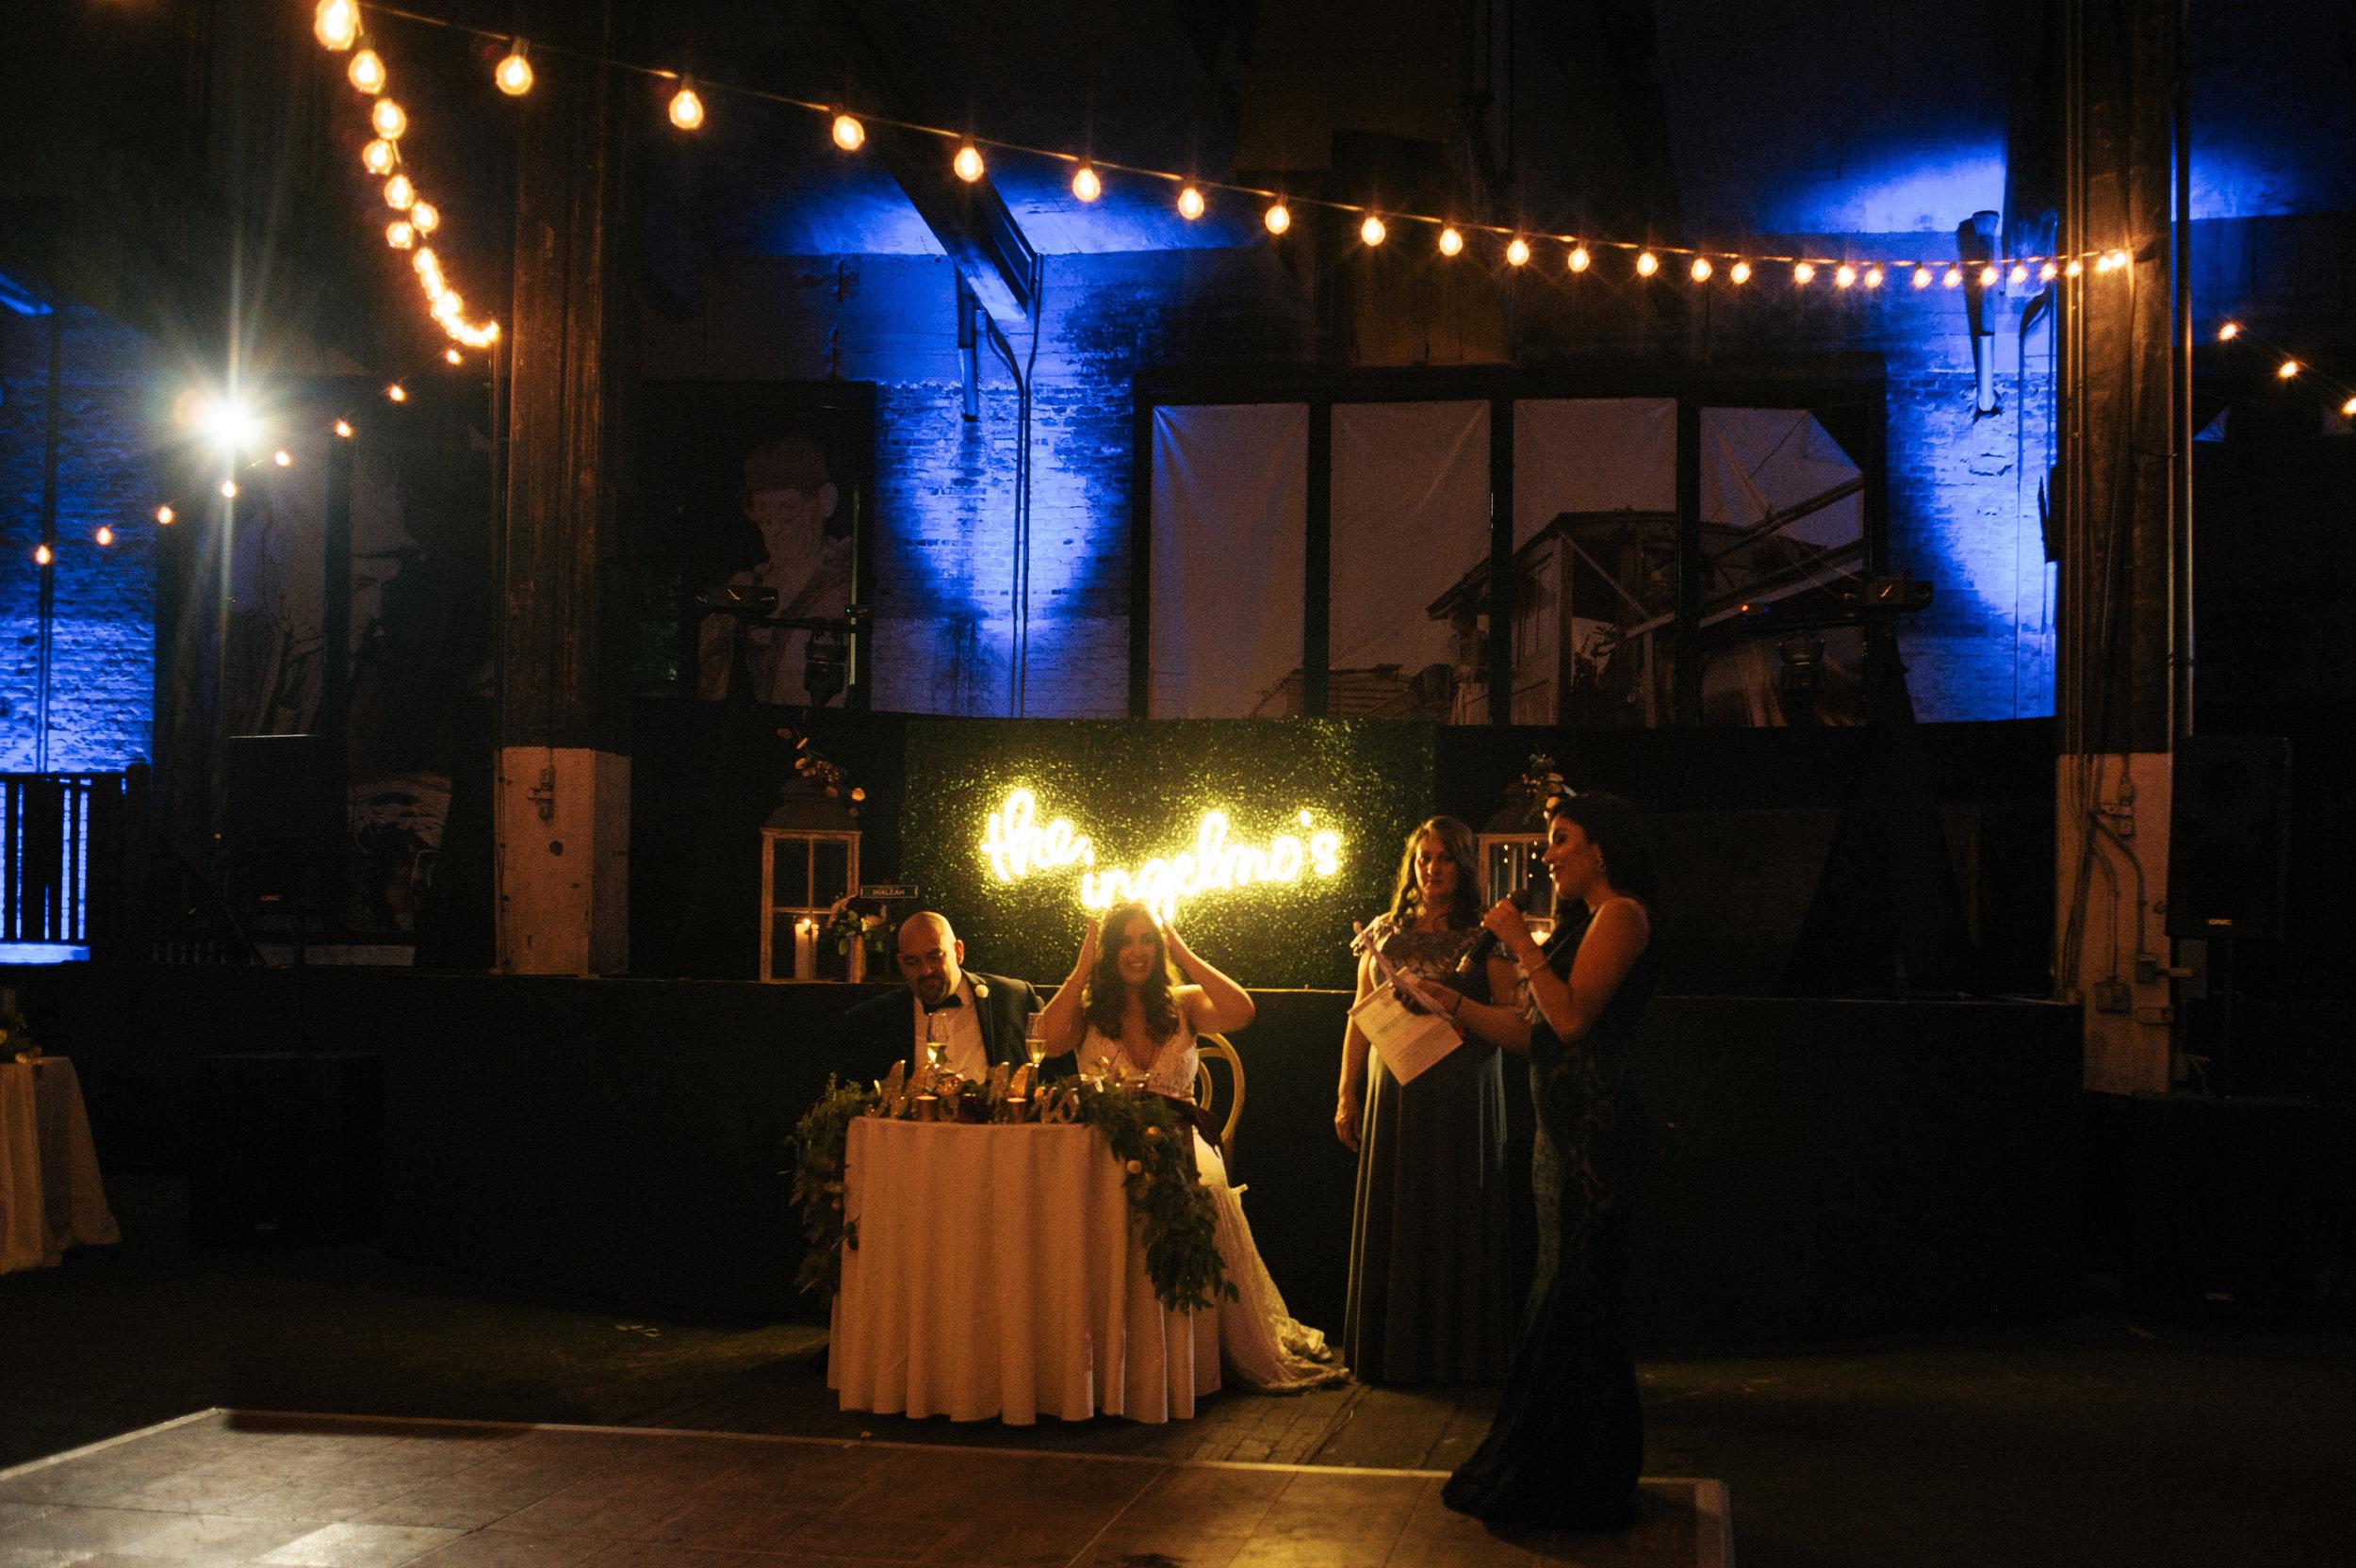 Iggy-and-yesenia-savannah-railroad-museum-wedding-meg-hill-photo- (742 of 866).jpg